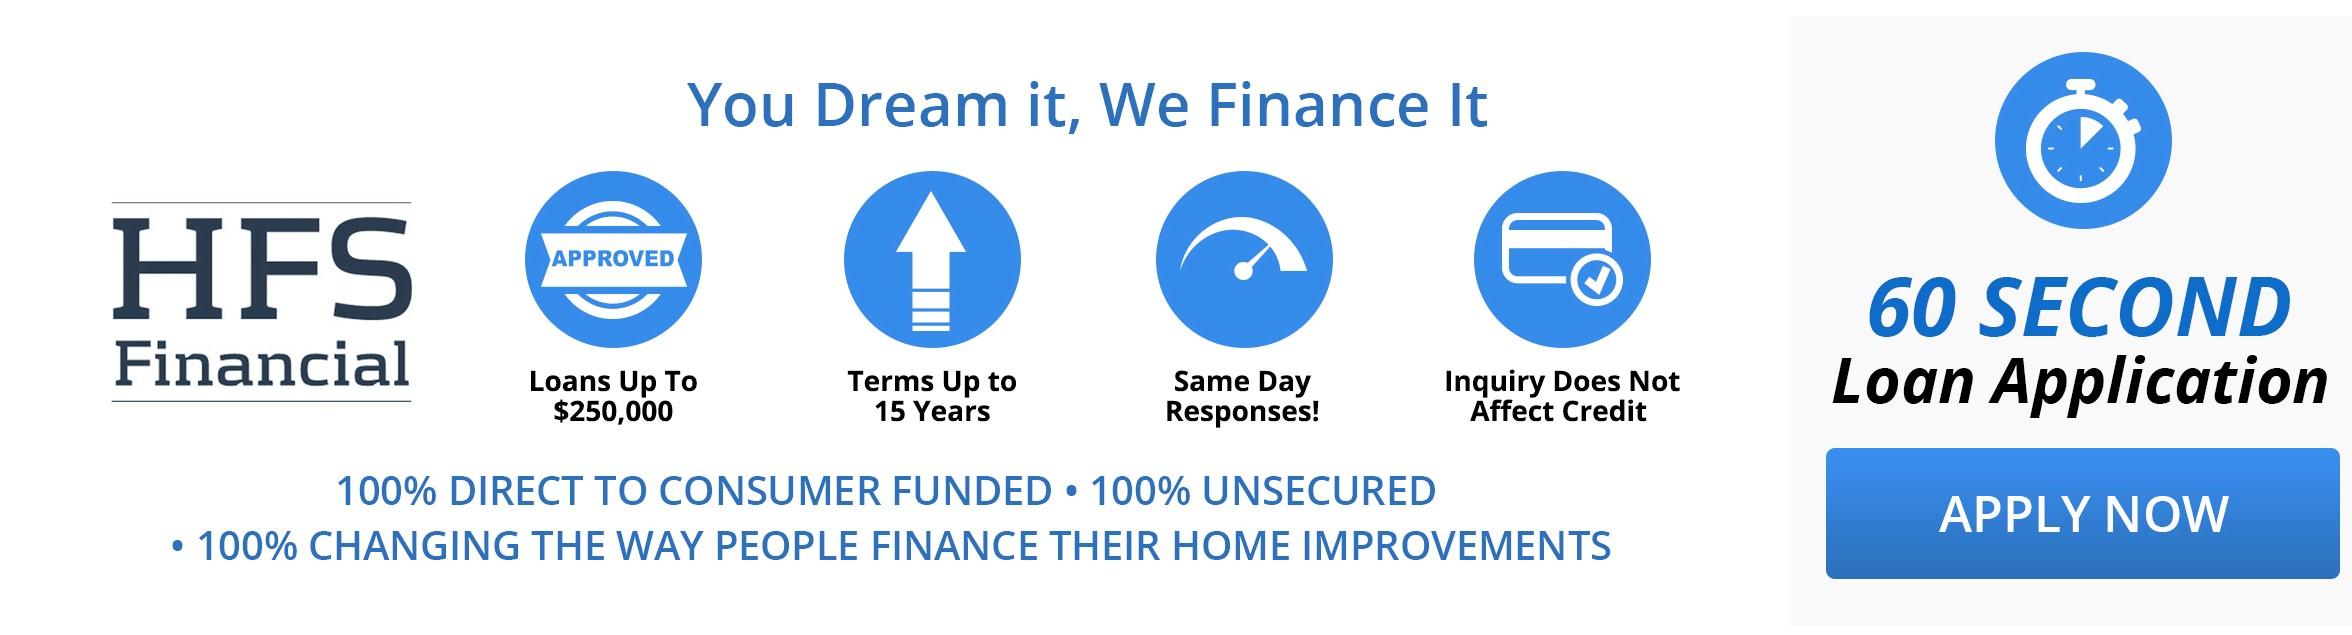 HFS Financial Link